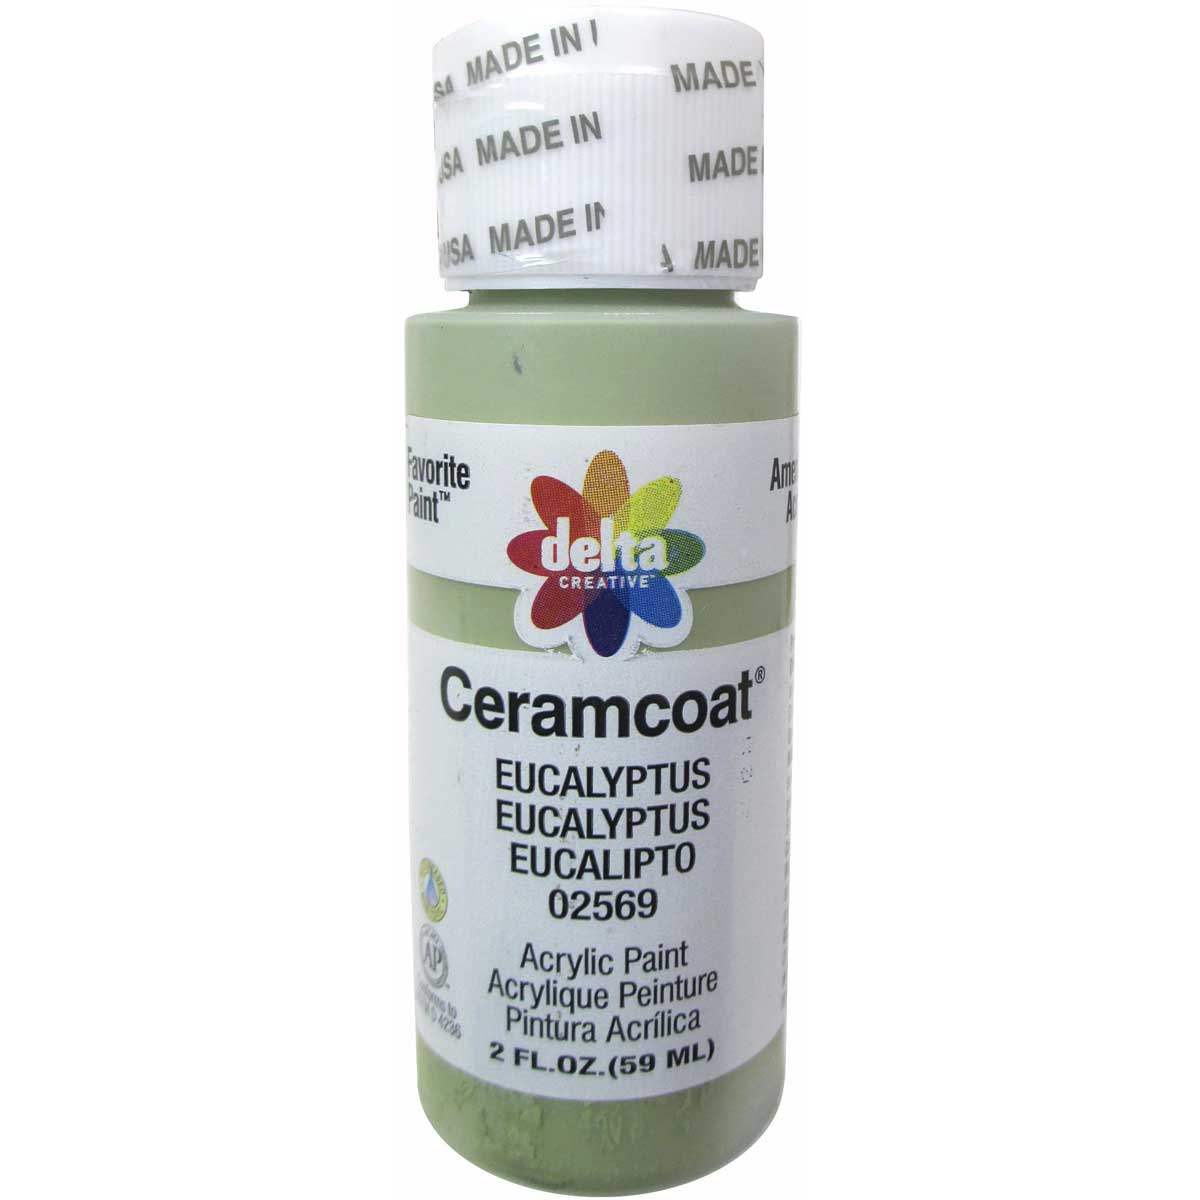 Delta Ceramcoat ® Acrylic Paint - Eucalyptus, 2 oz. - 025690202W